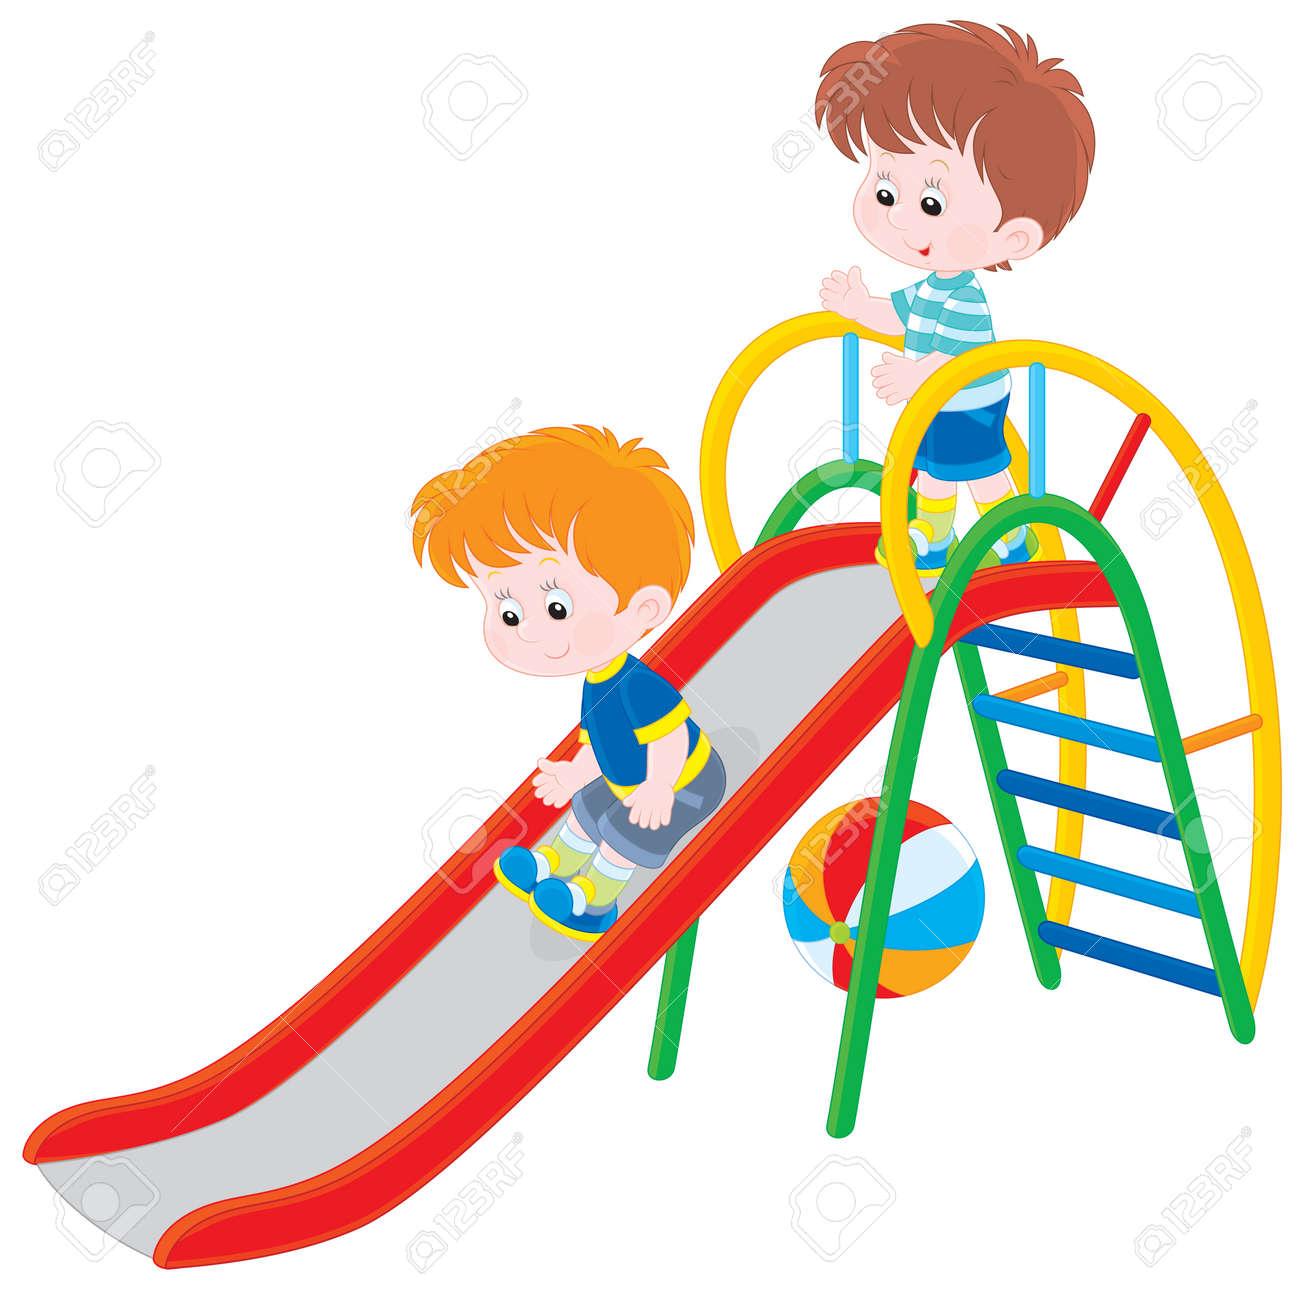 Children on a slide - 25438908